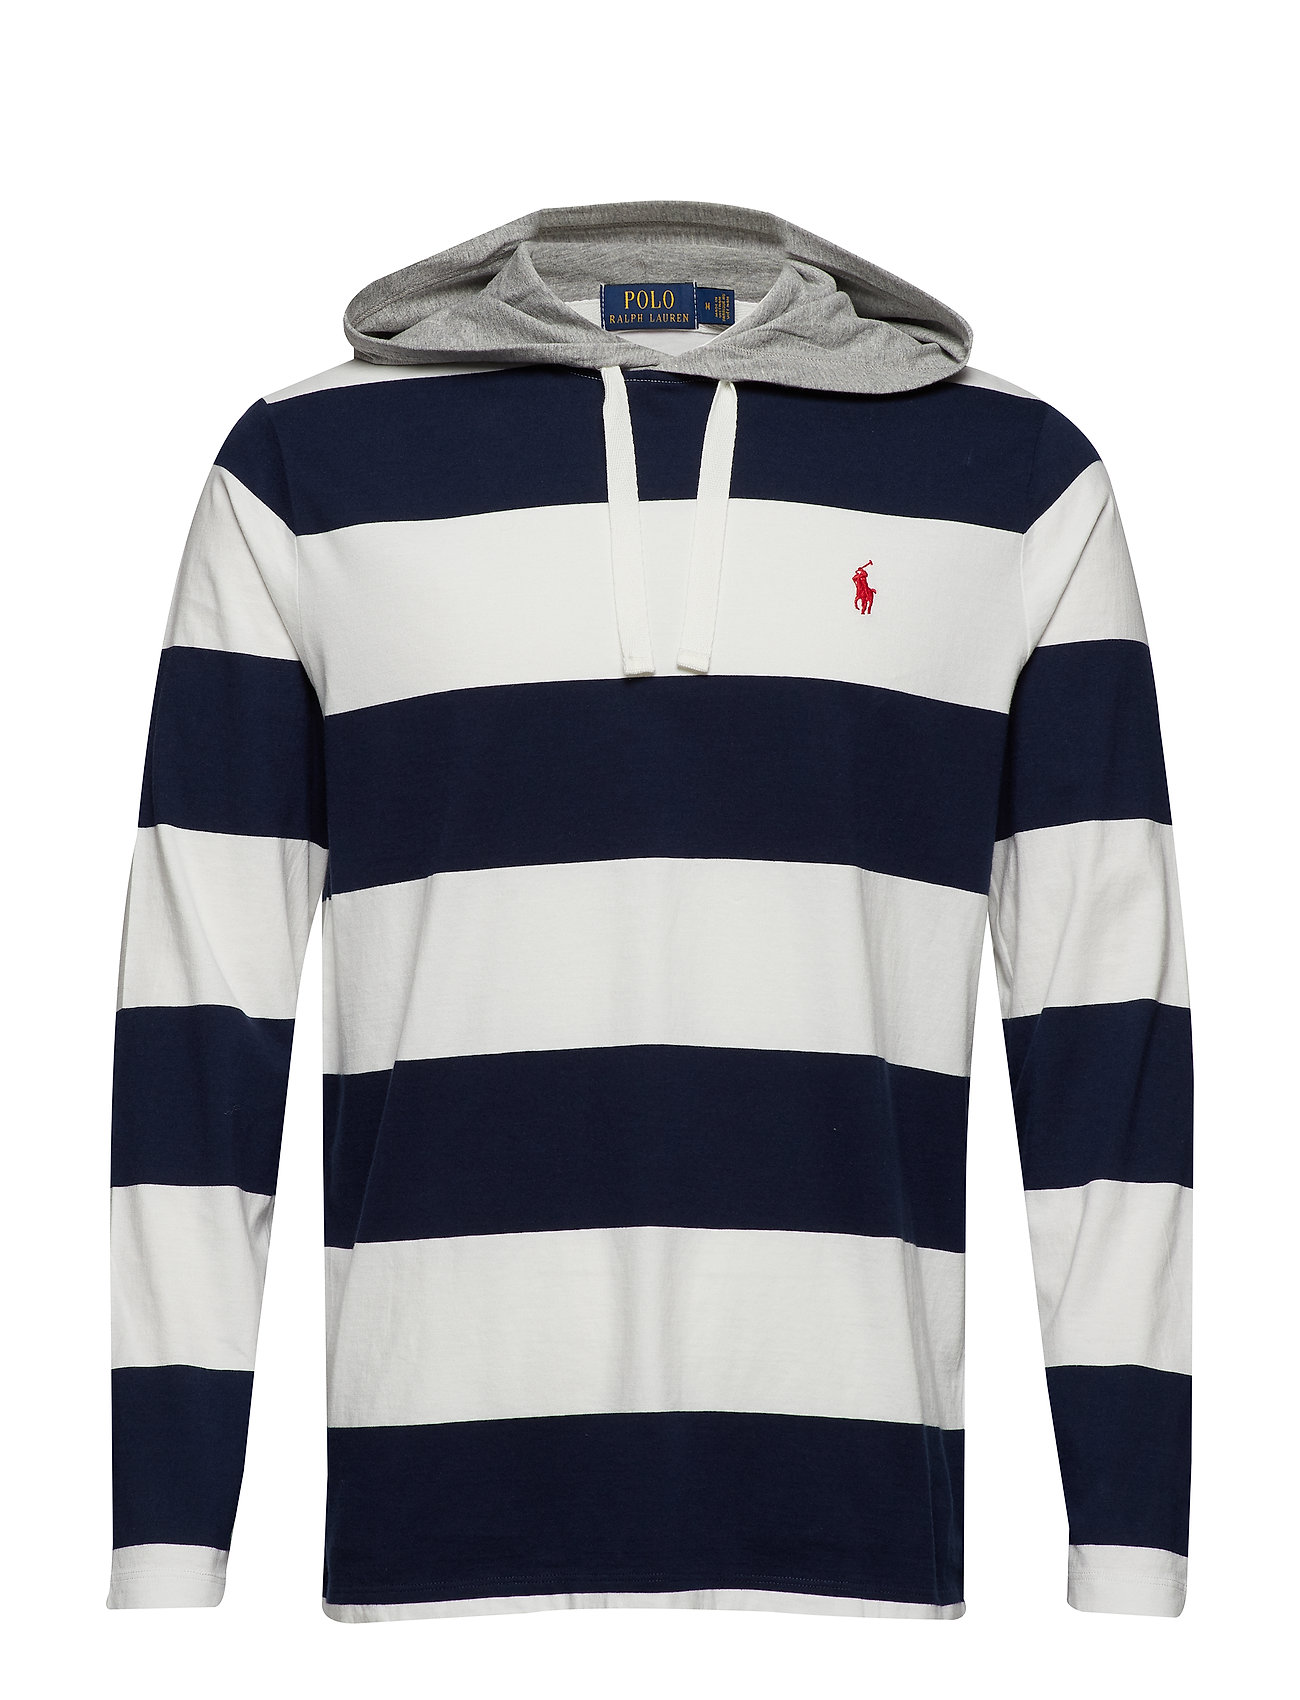 4732d225940 Cotton Jersey Hooded T-shirt (Cruise Navy/deckw) (£51) - Polo Ralph ...